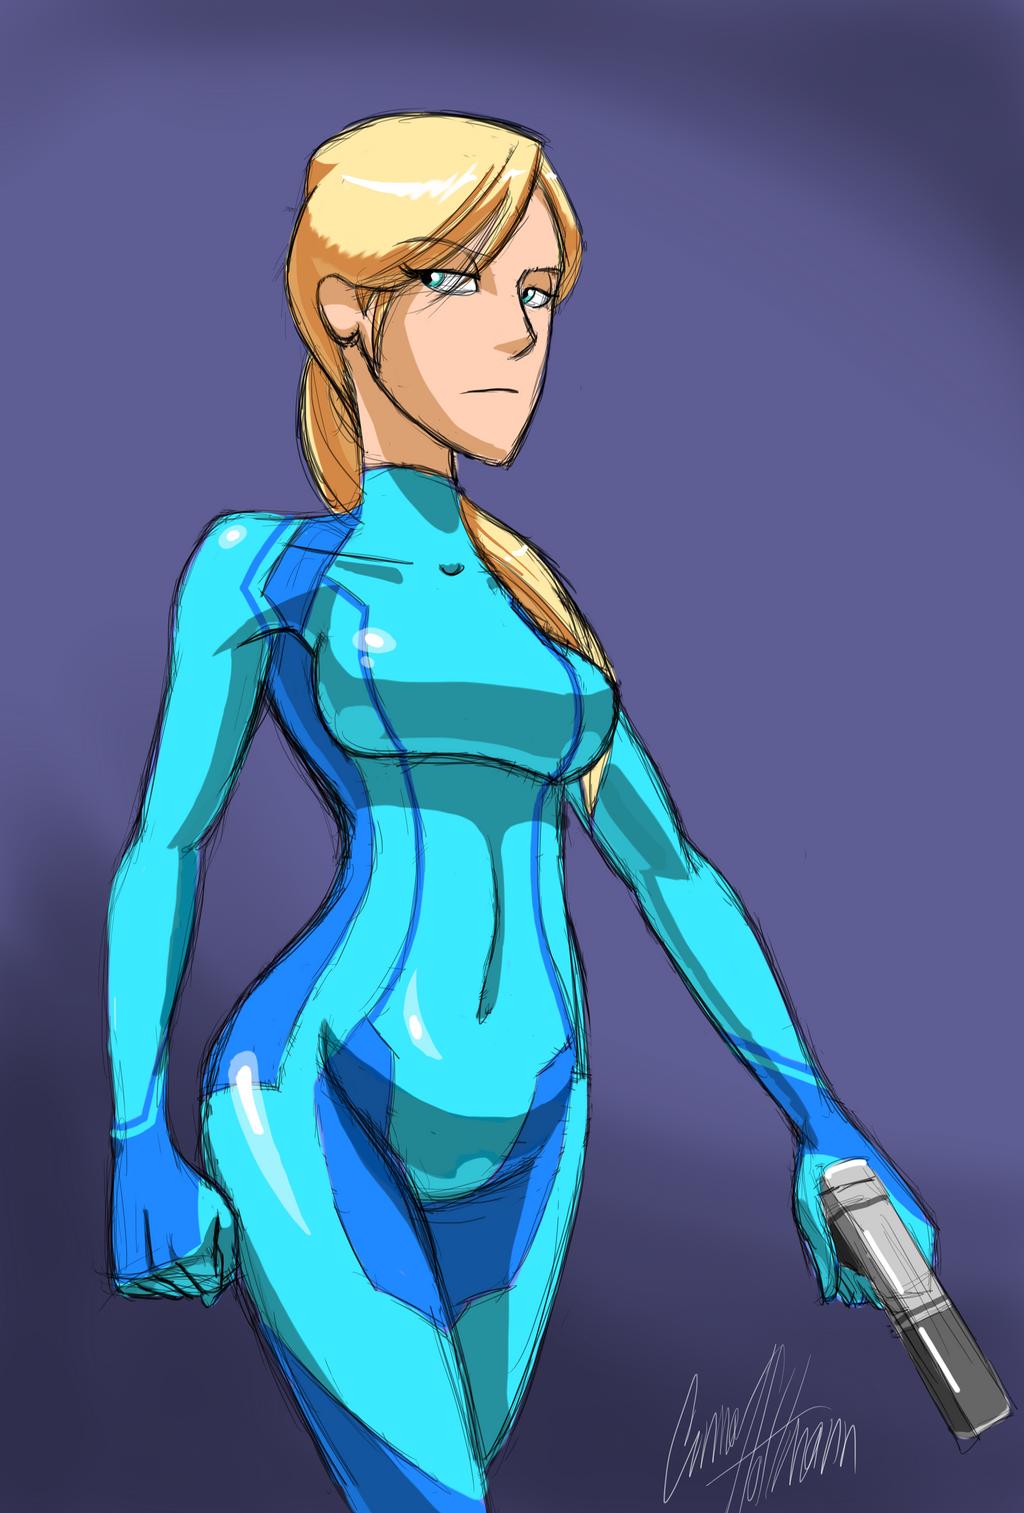 Zero Suit Samus Aran by Ceehoff